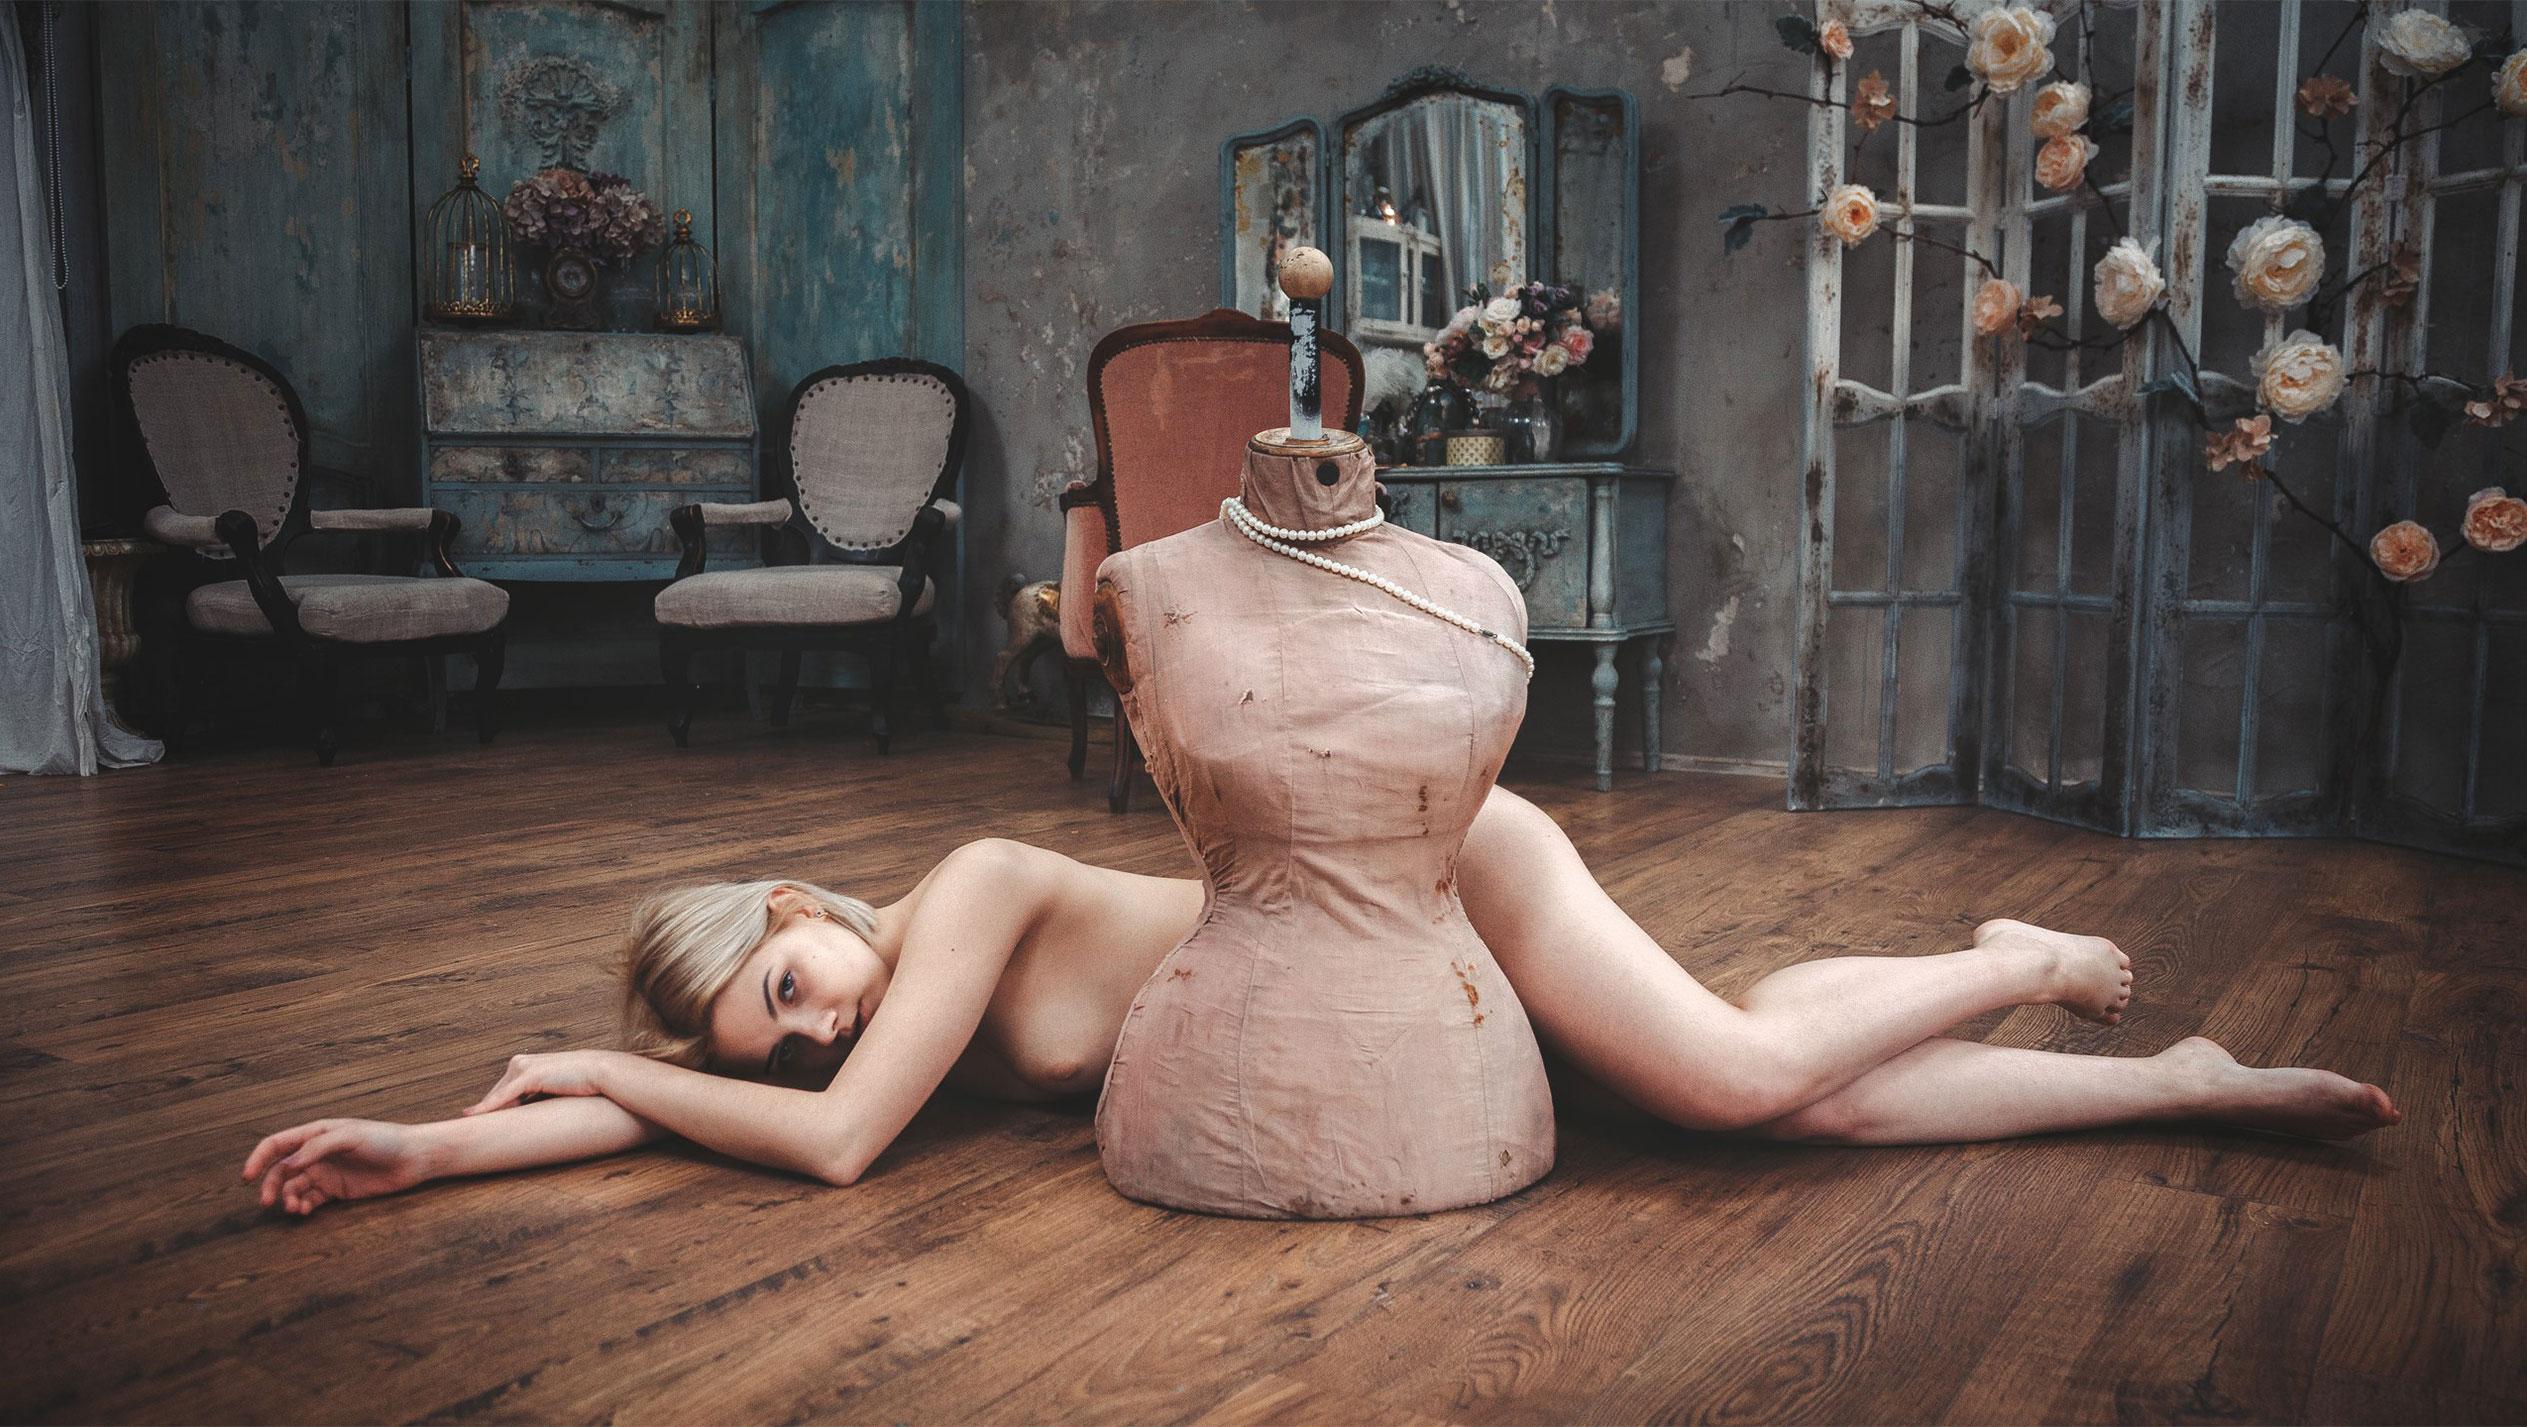 Виктория Соколова / Victoria Sokolova by Andrey Vasilyev